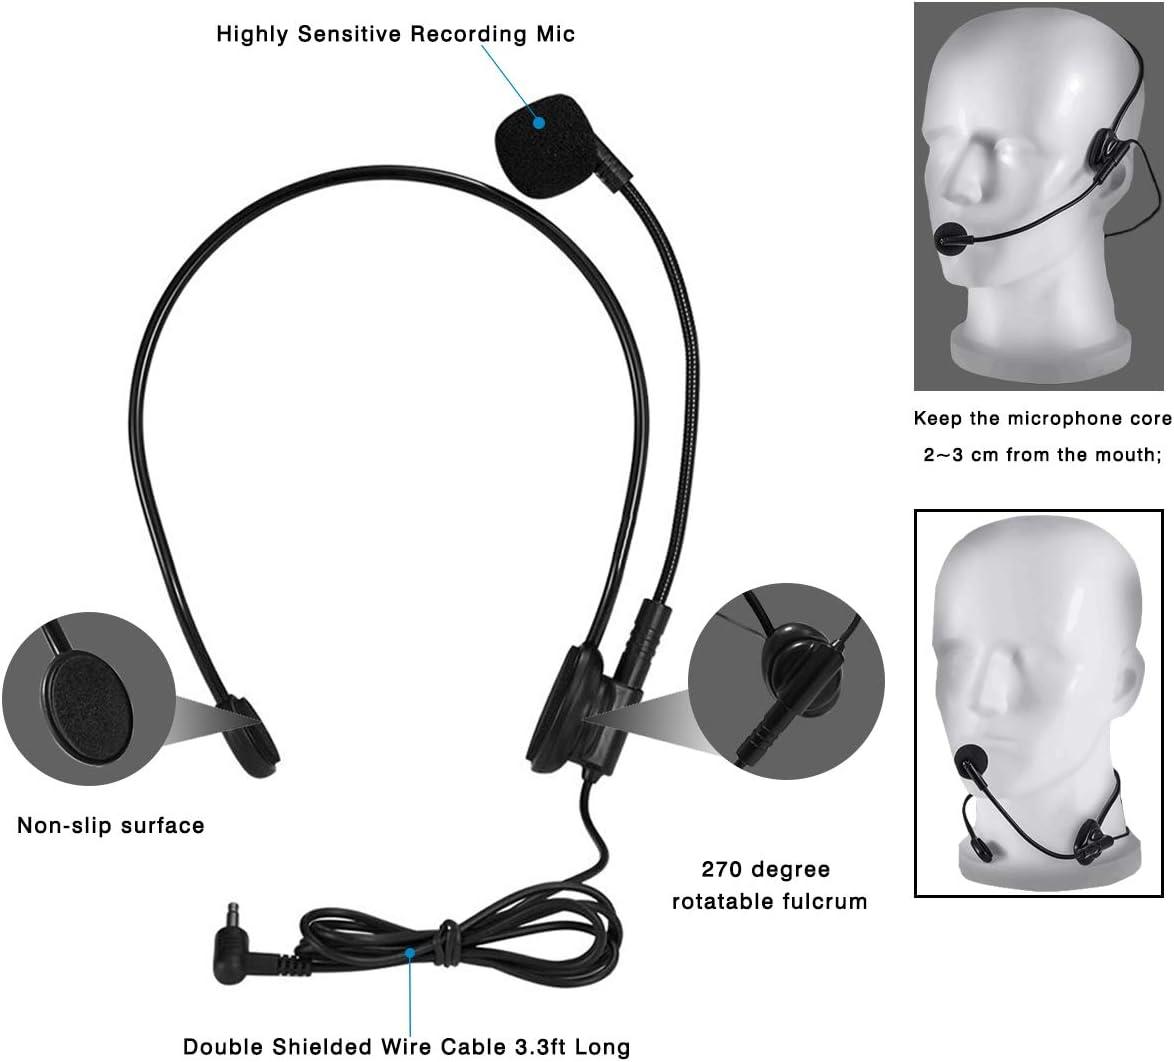 15W bater/ía recargable Voice Amplifier entrenadores deportivos, SHIDU Amplificador de voz port/átil con micr/ófono Bluetooth amplificador voz para profesores sistema de megafon/ía gu/ías tur/ísticos